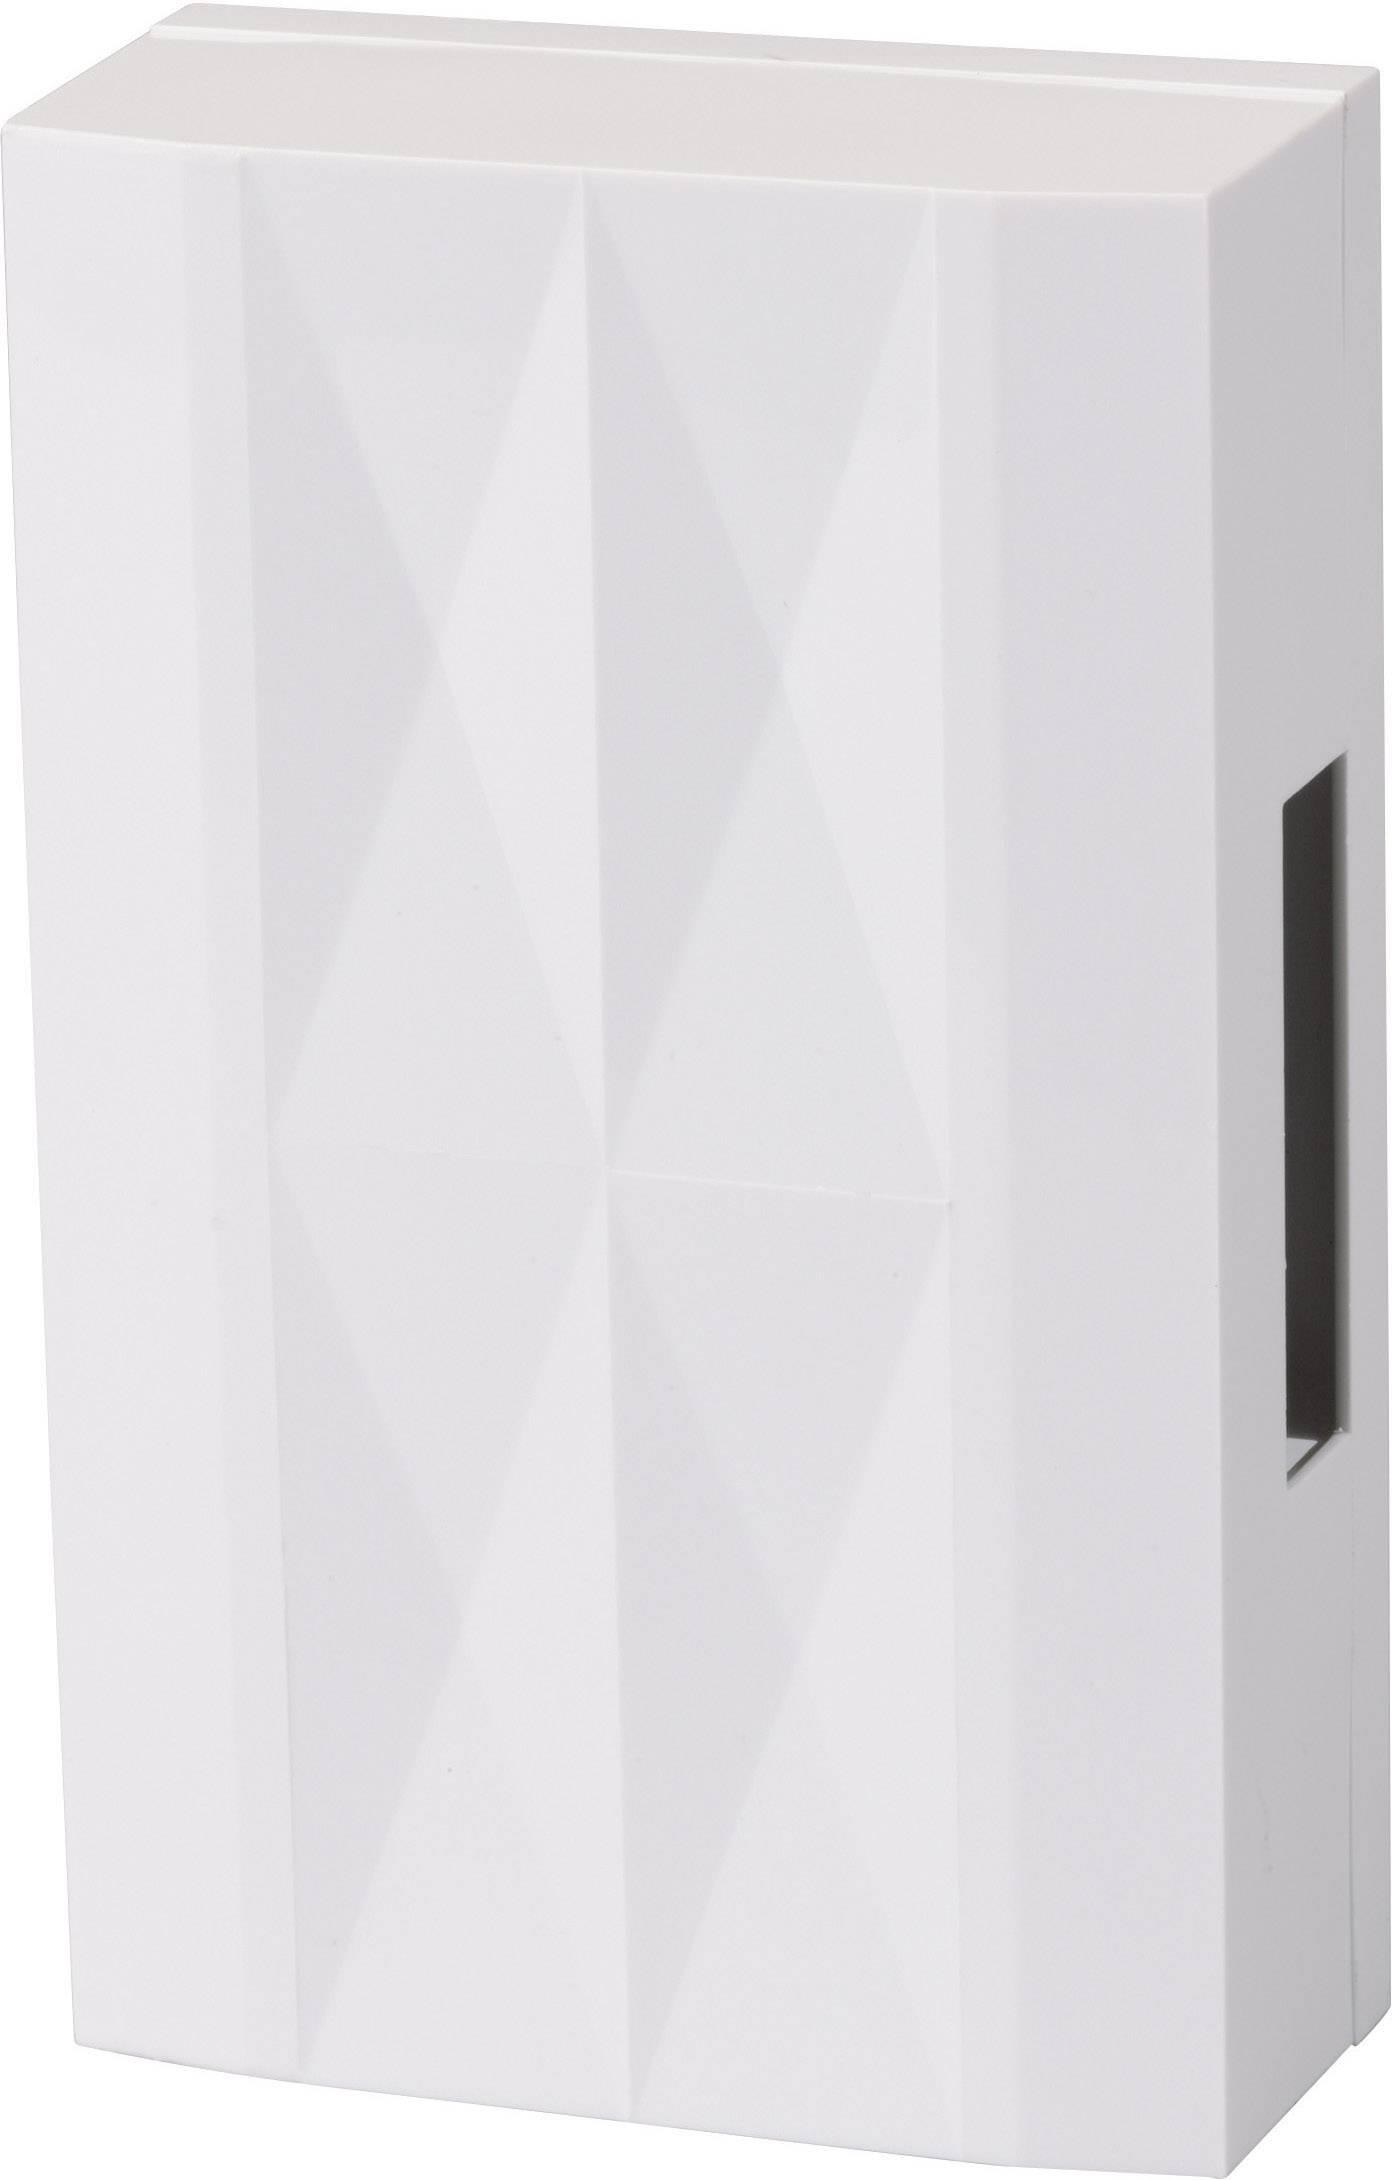 Gong Heidemann 70215 70215, 8 V (max), 85 dB (A), biela